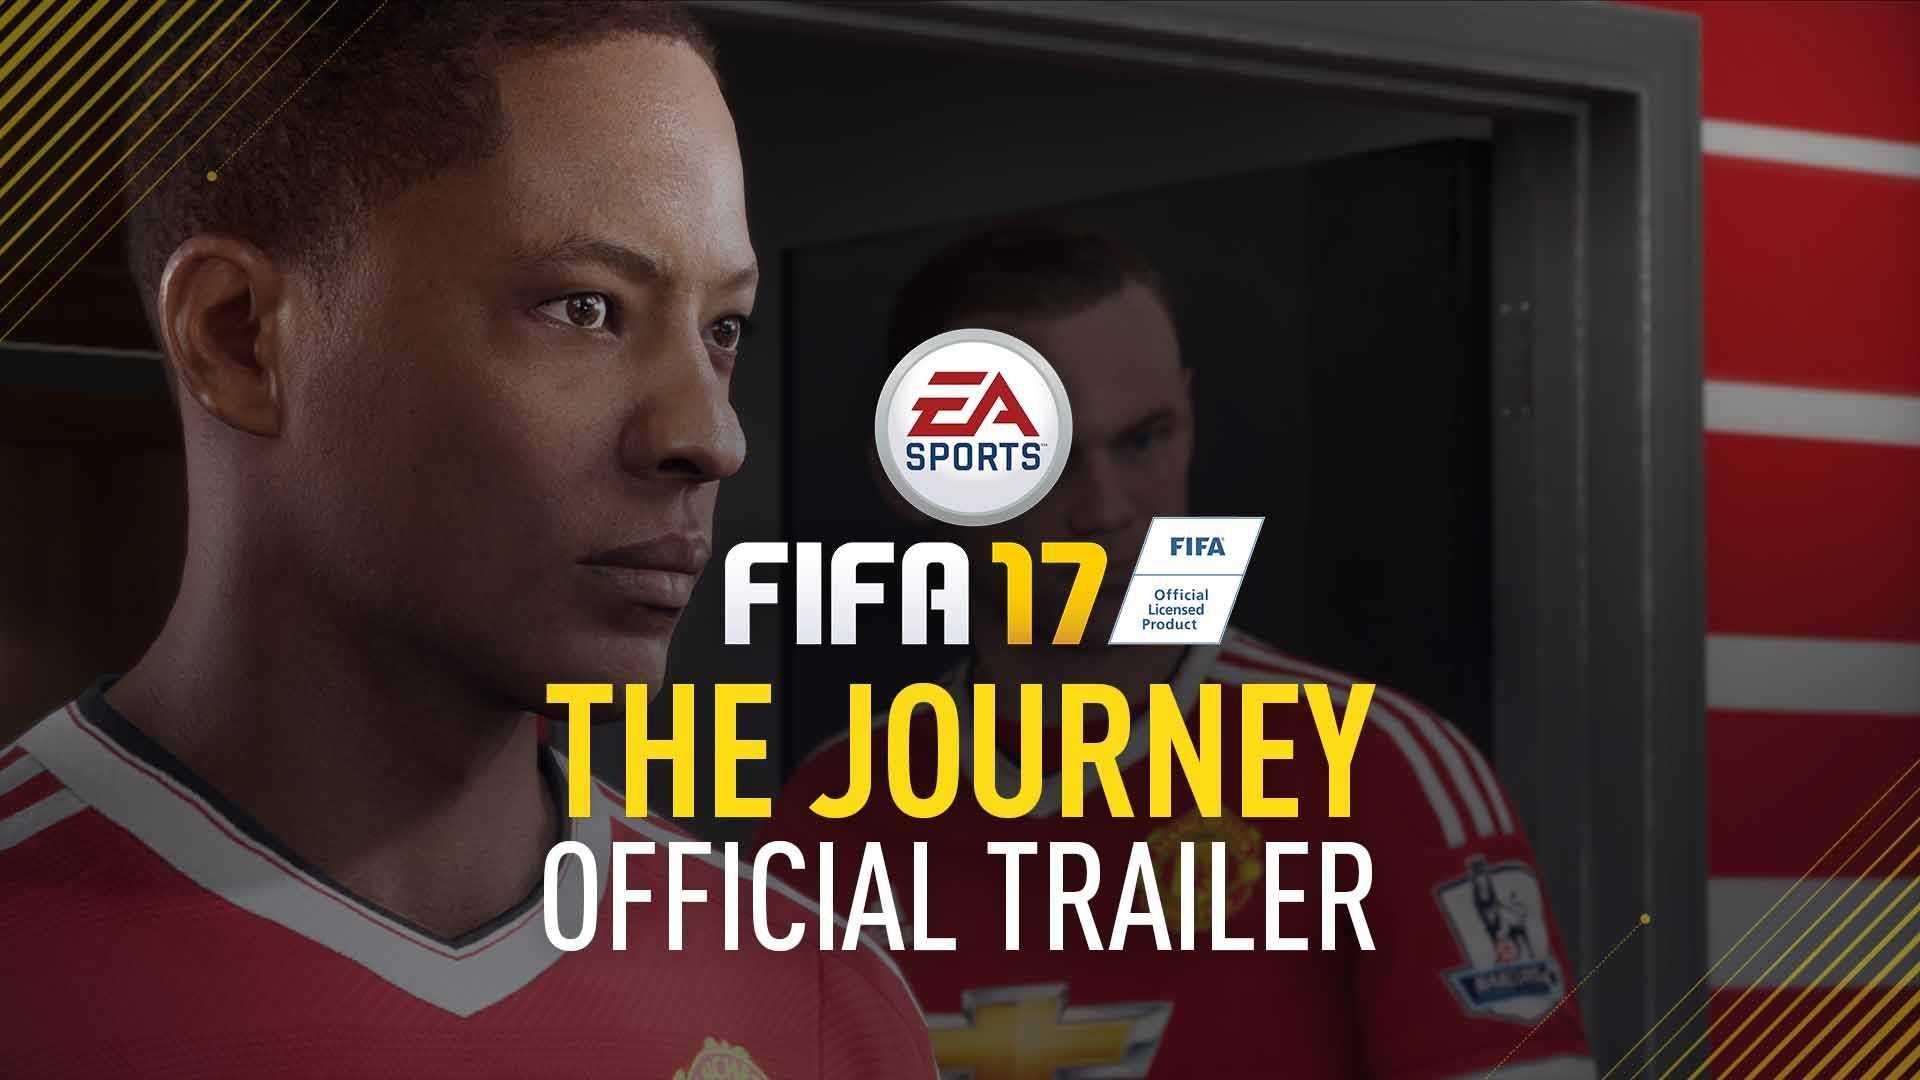 FIFA 17 Hikaye modu The Journey Fragman